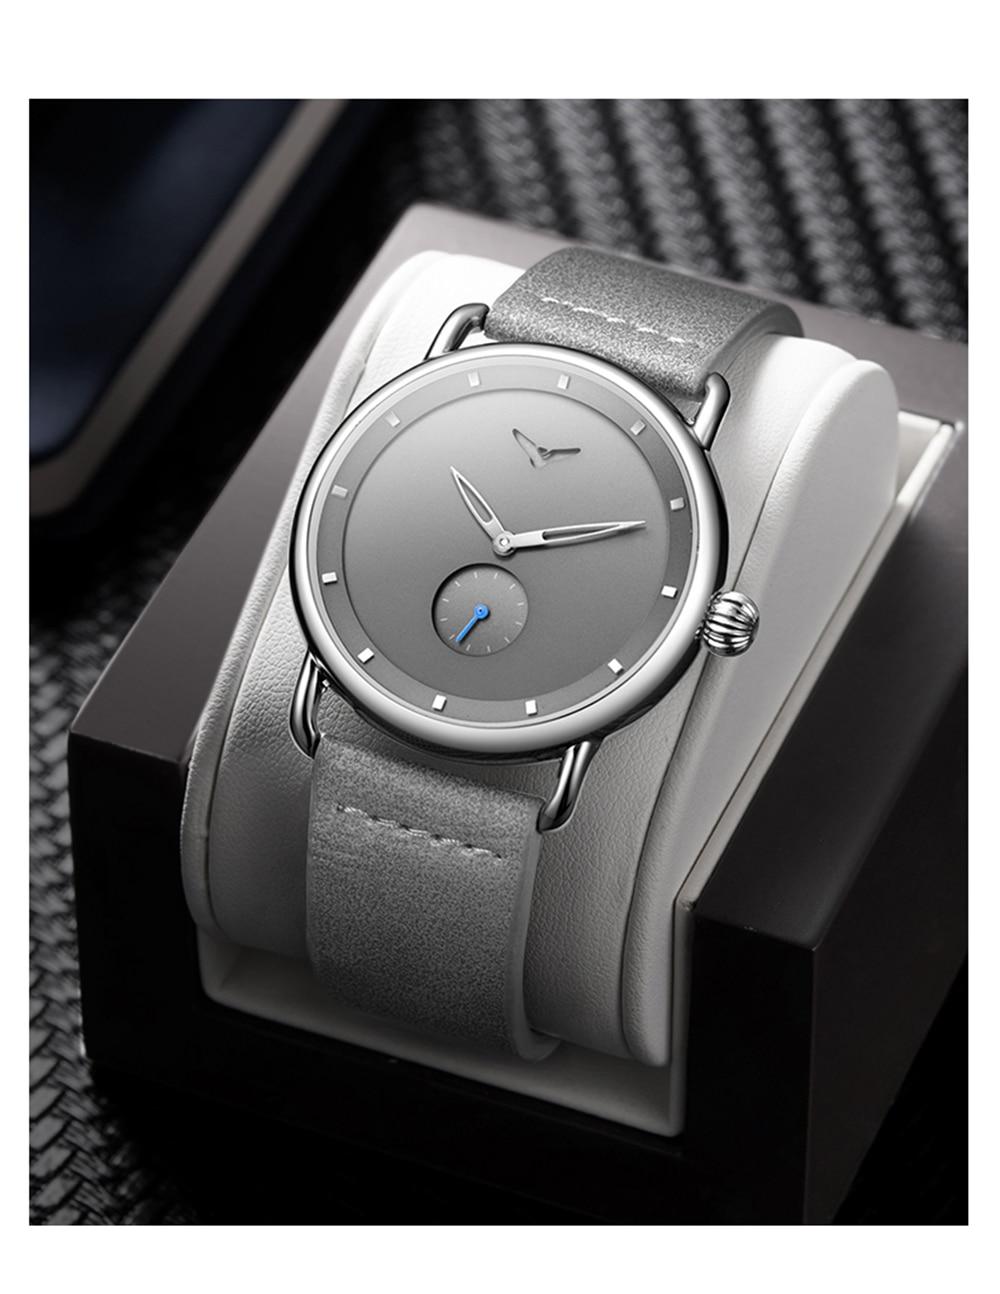 He878ac4cf6de4d18b928a626b00018d0f ONOLA top brand leather men watches clock fashion sport simple casual waterproof Wrist watch men relogio masculino